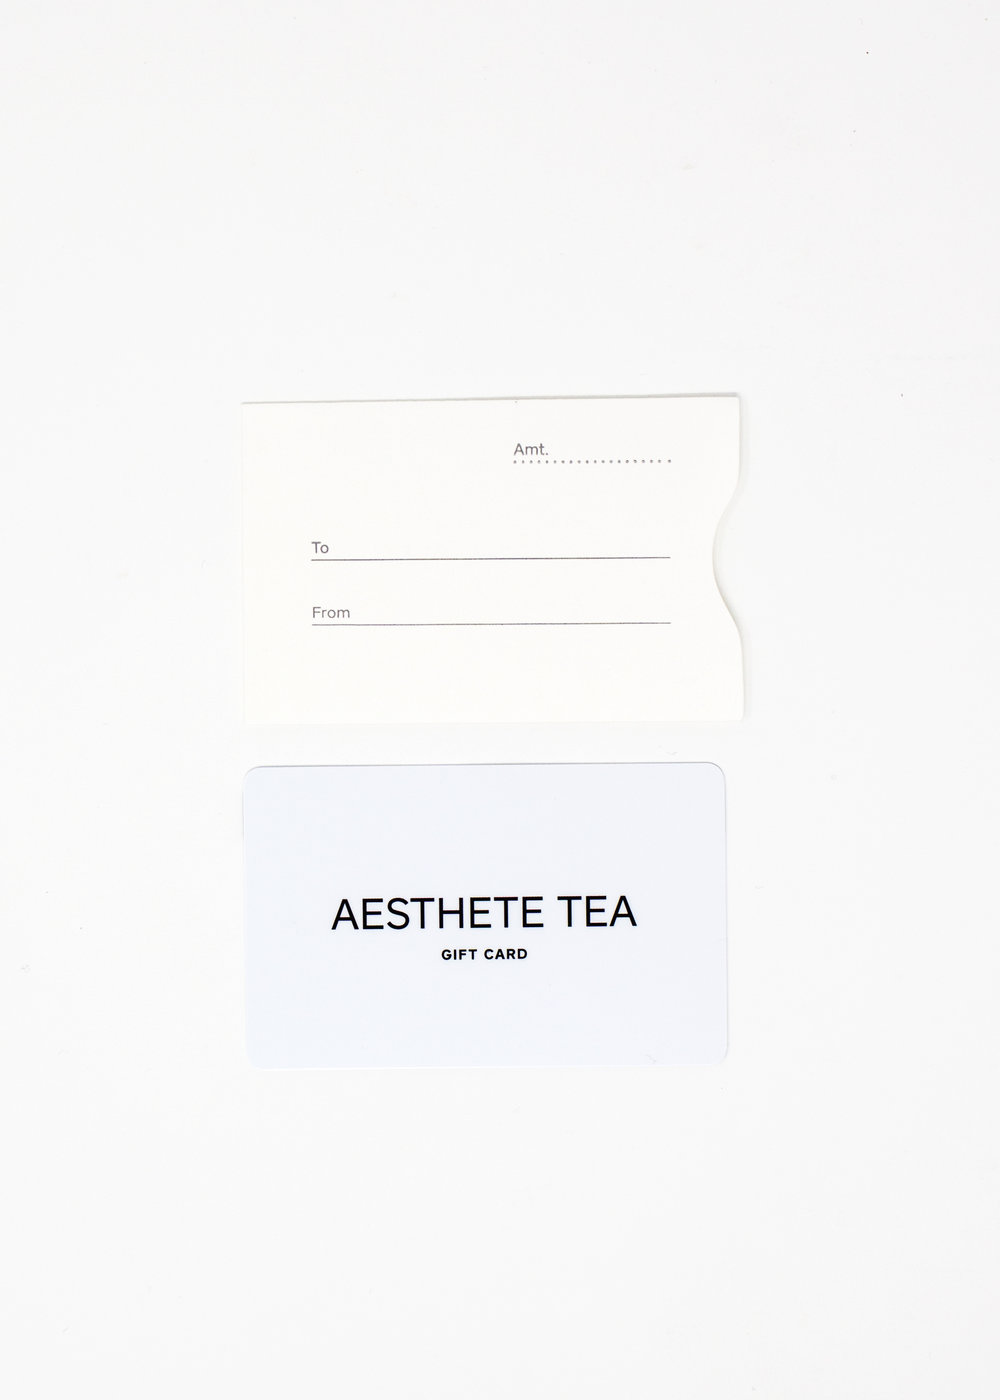 Digital Gift Card Online Store Use Only Aesthete Tea Voucher